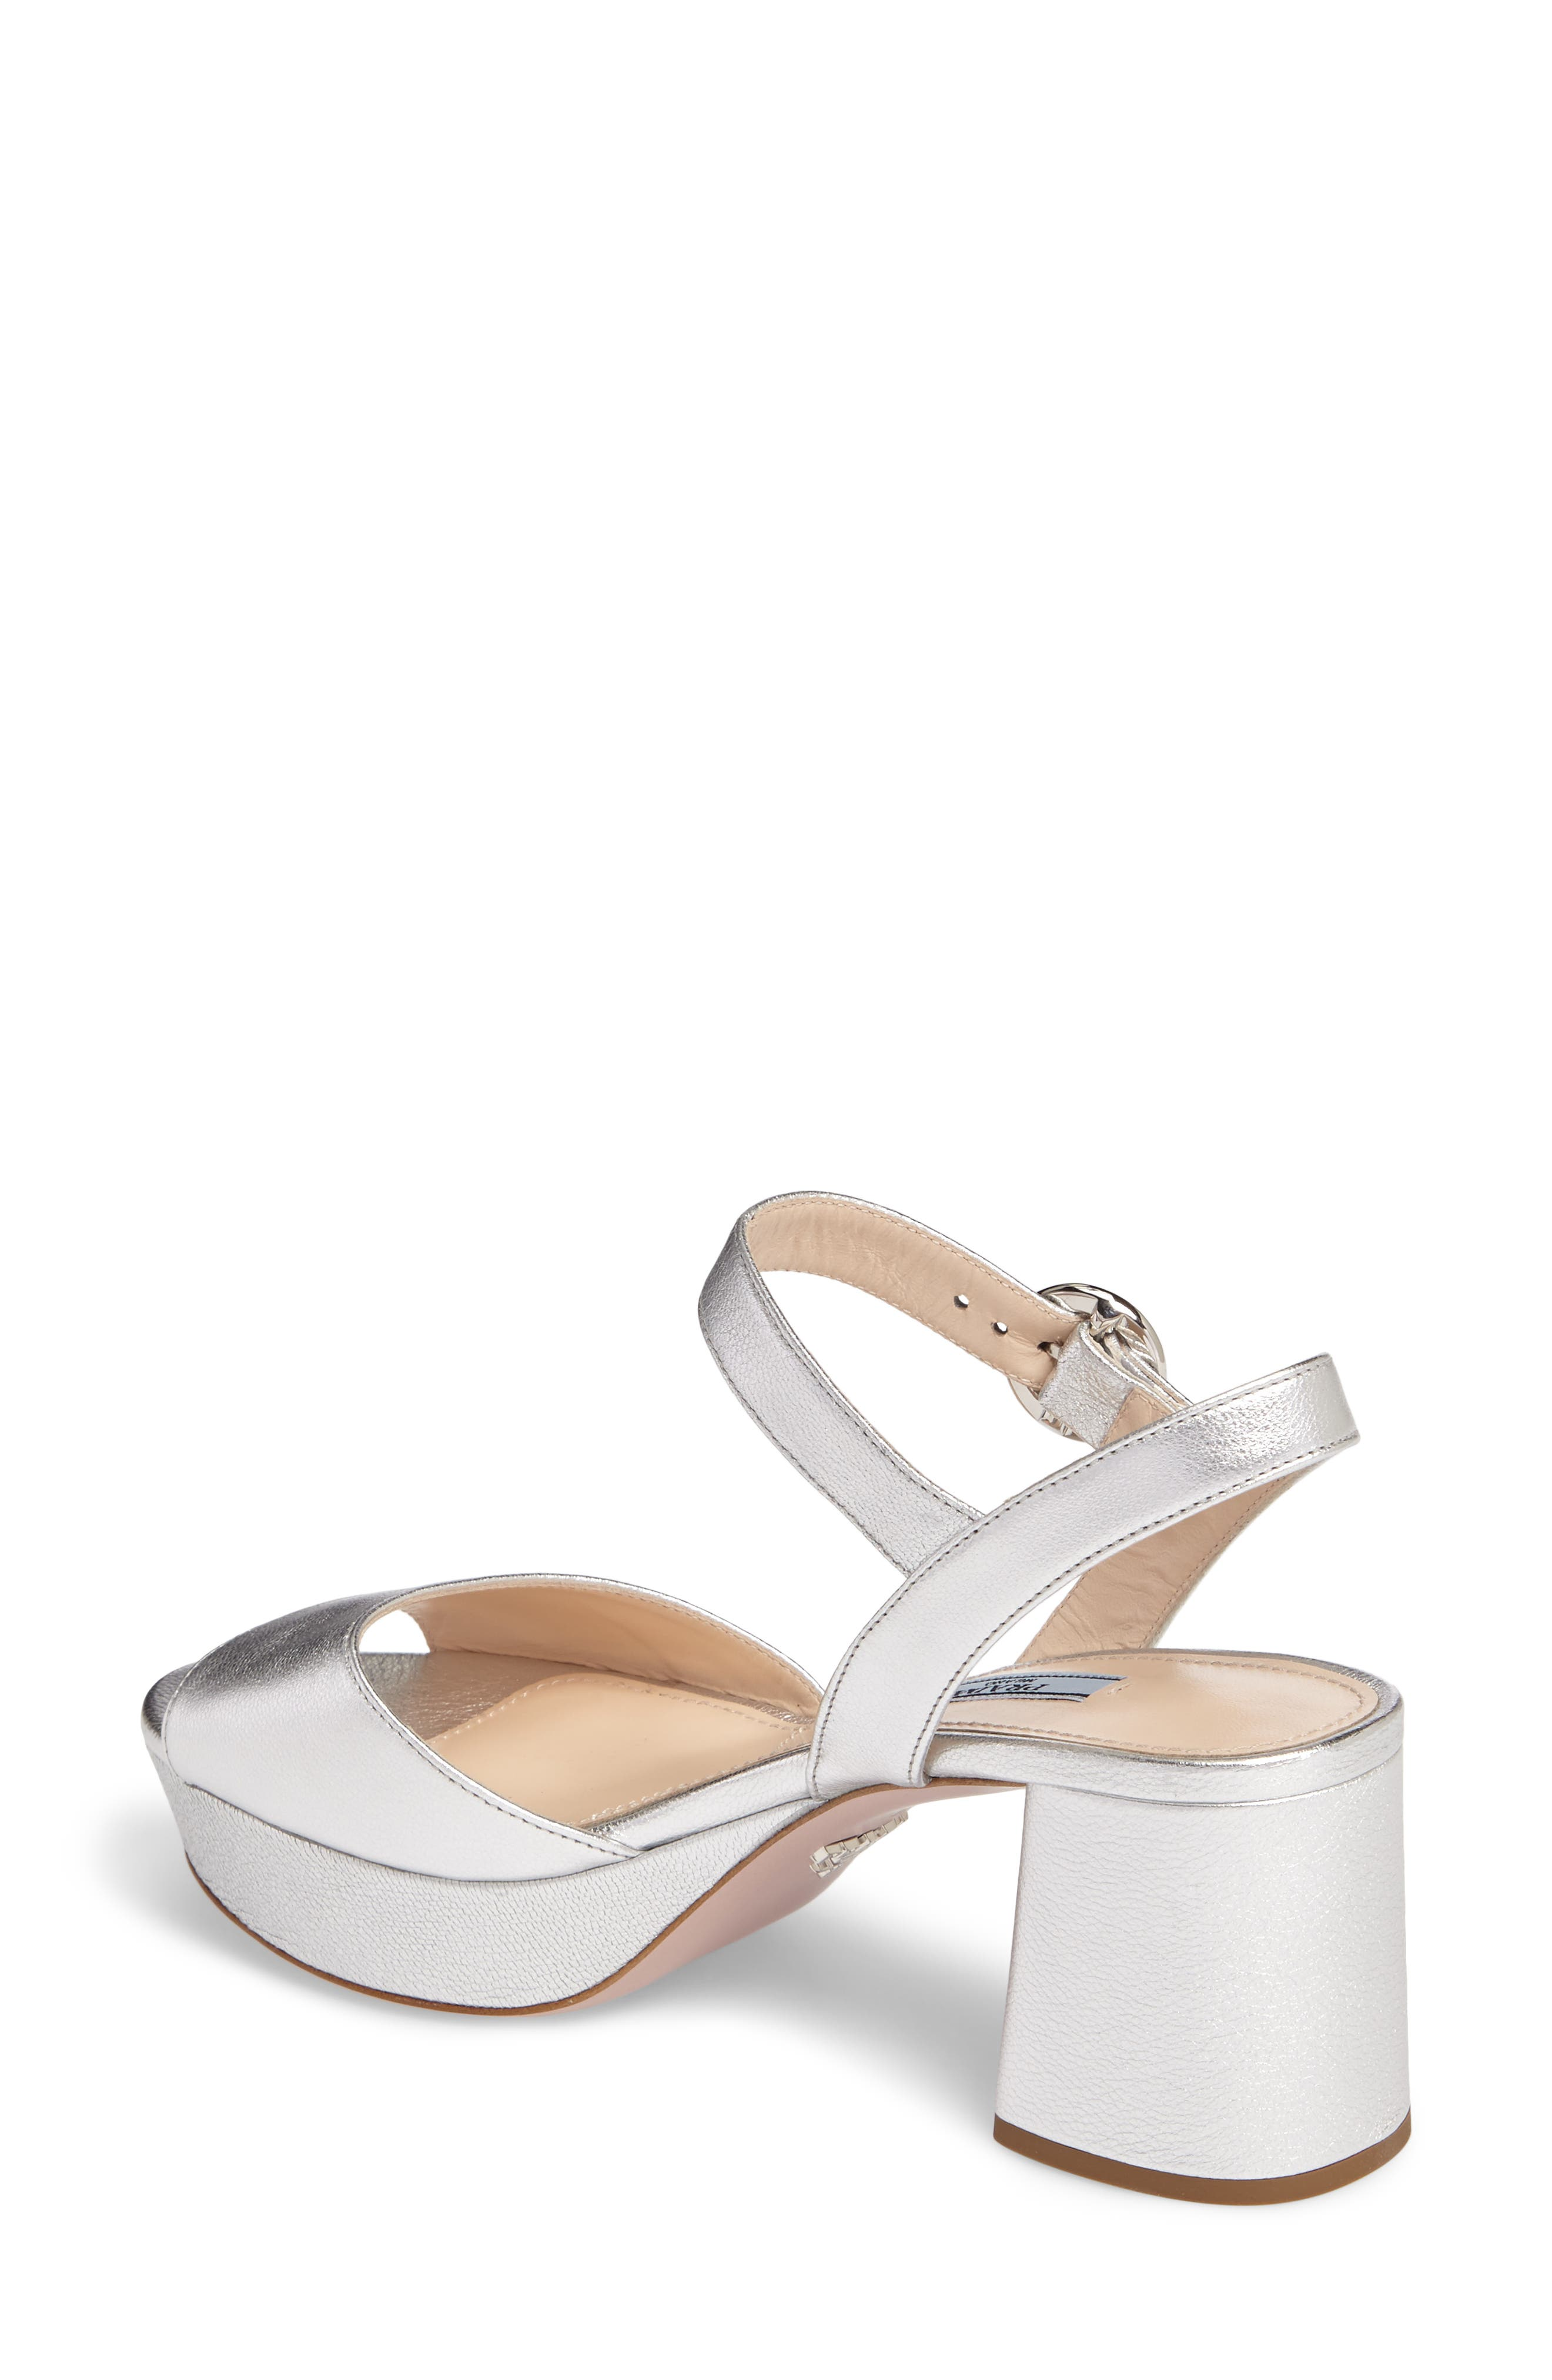 Ankle Strap Platform Sandal,                             Alternate thumbnail 2, color,                             Silver